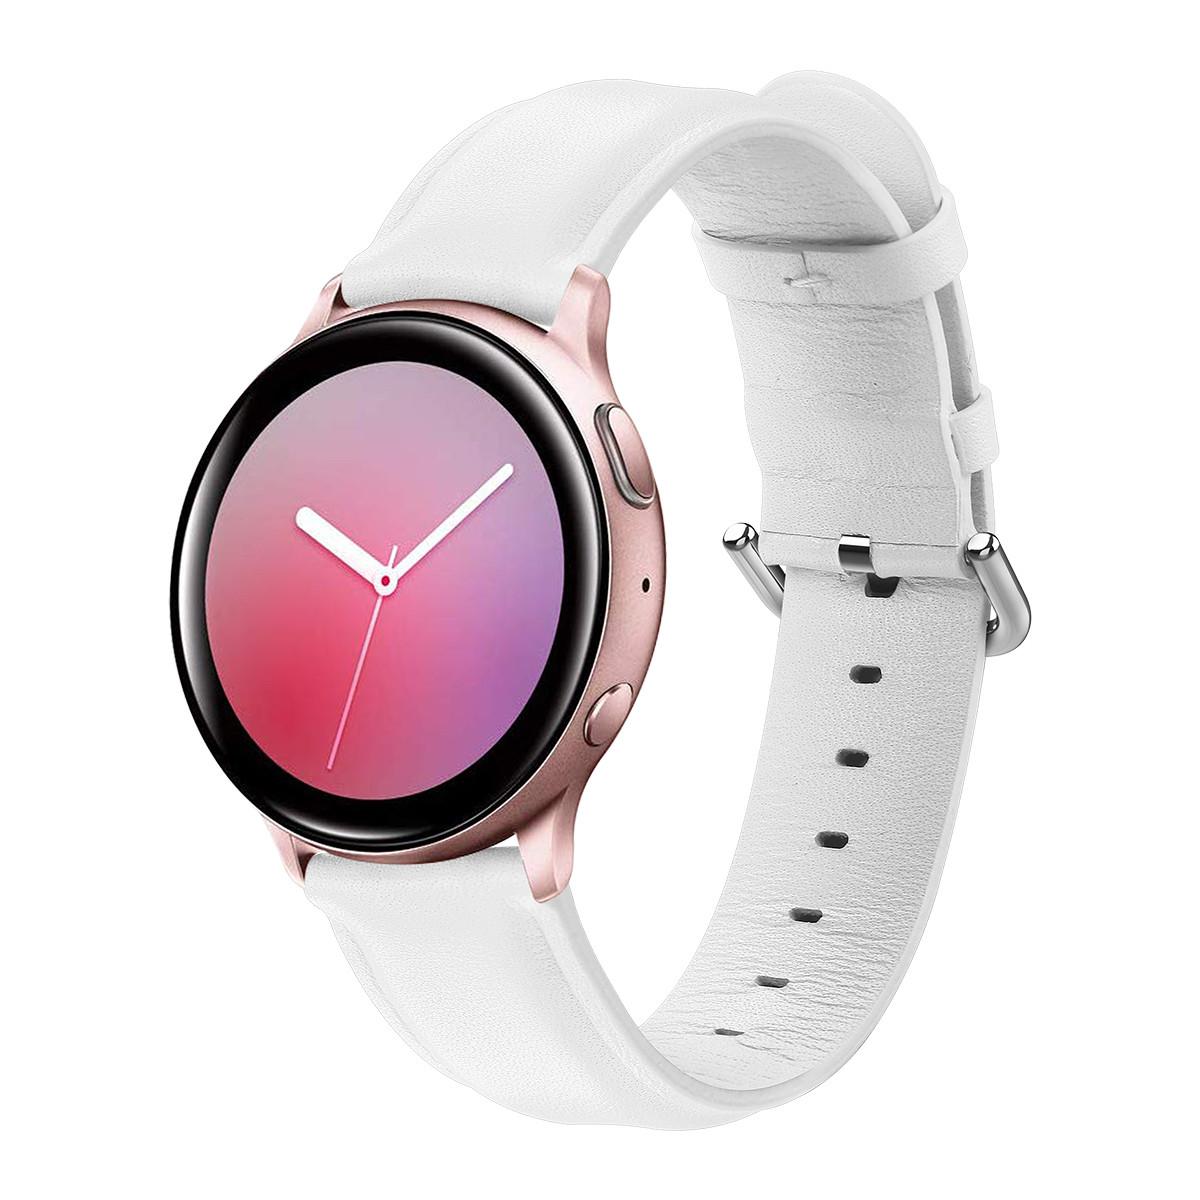 Ремешок BeWatch кожаный 20мм для Samsung Active | Active 2 | Galaxy watch 42mm Белый S (1220102.S)